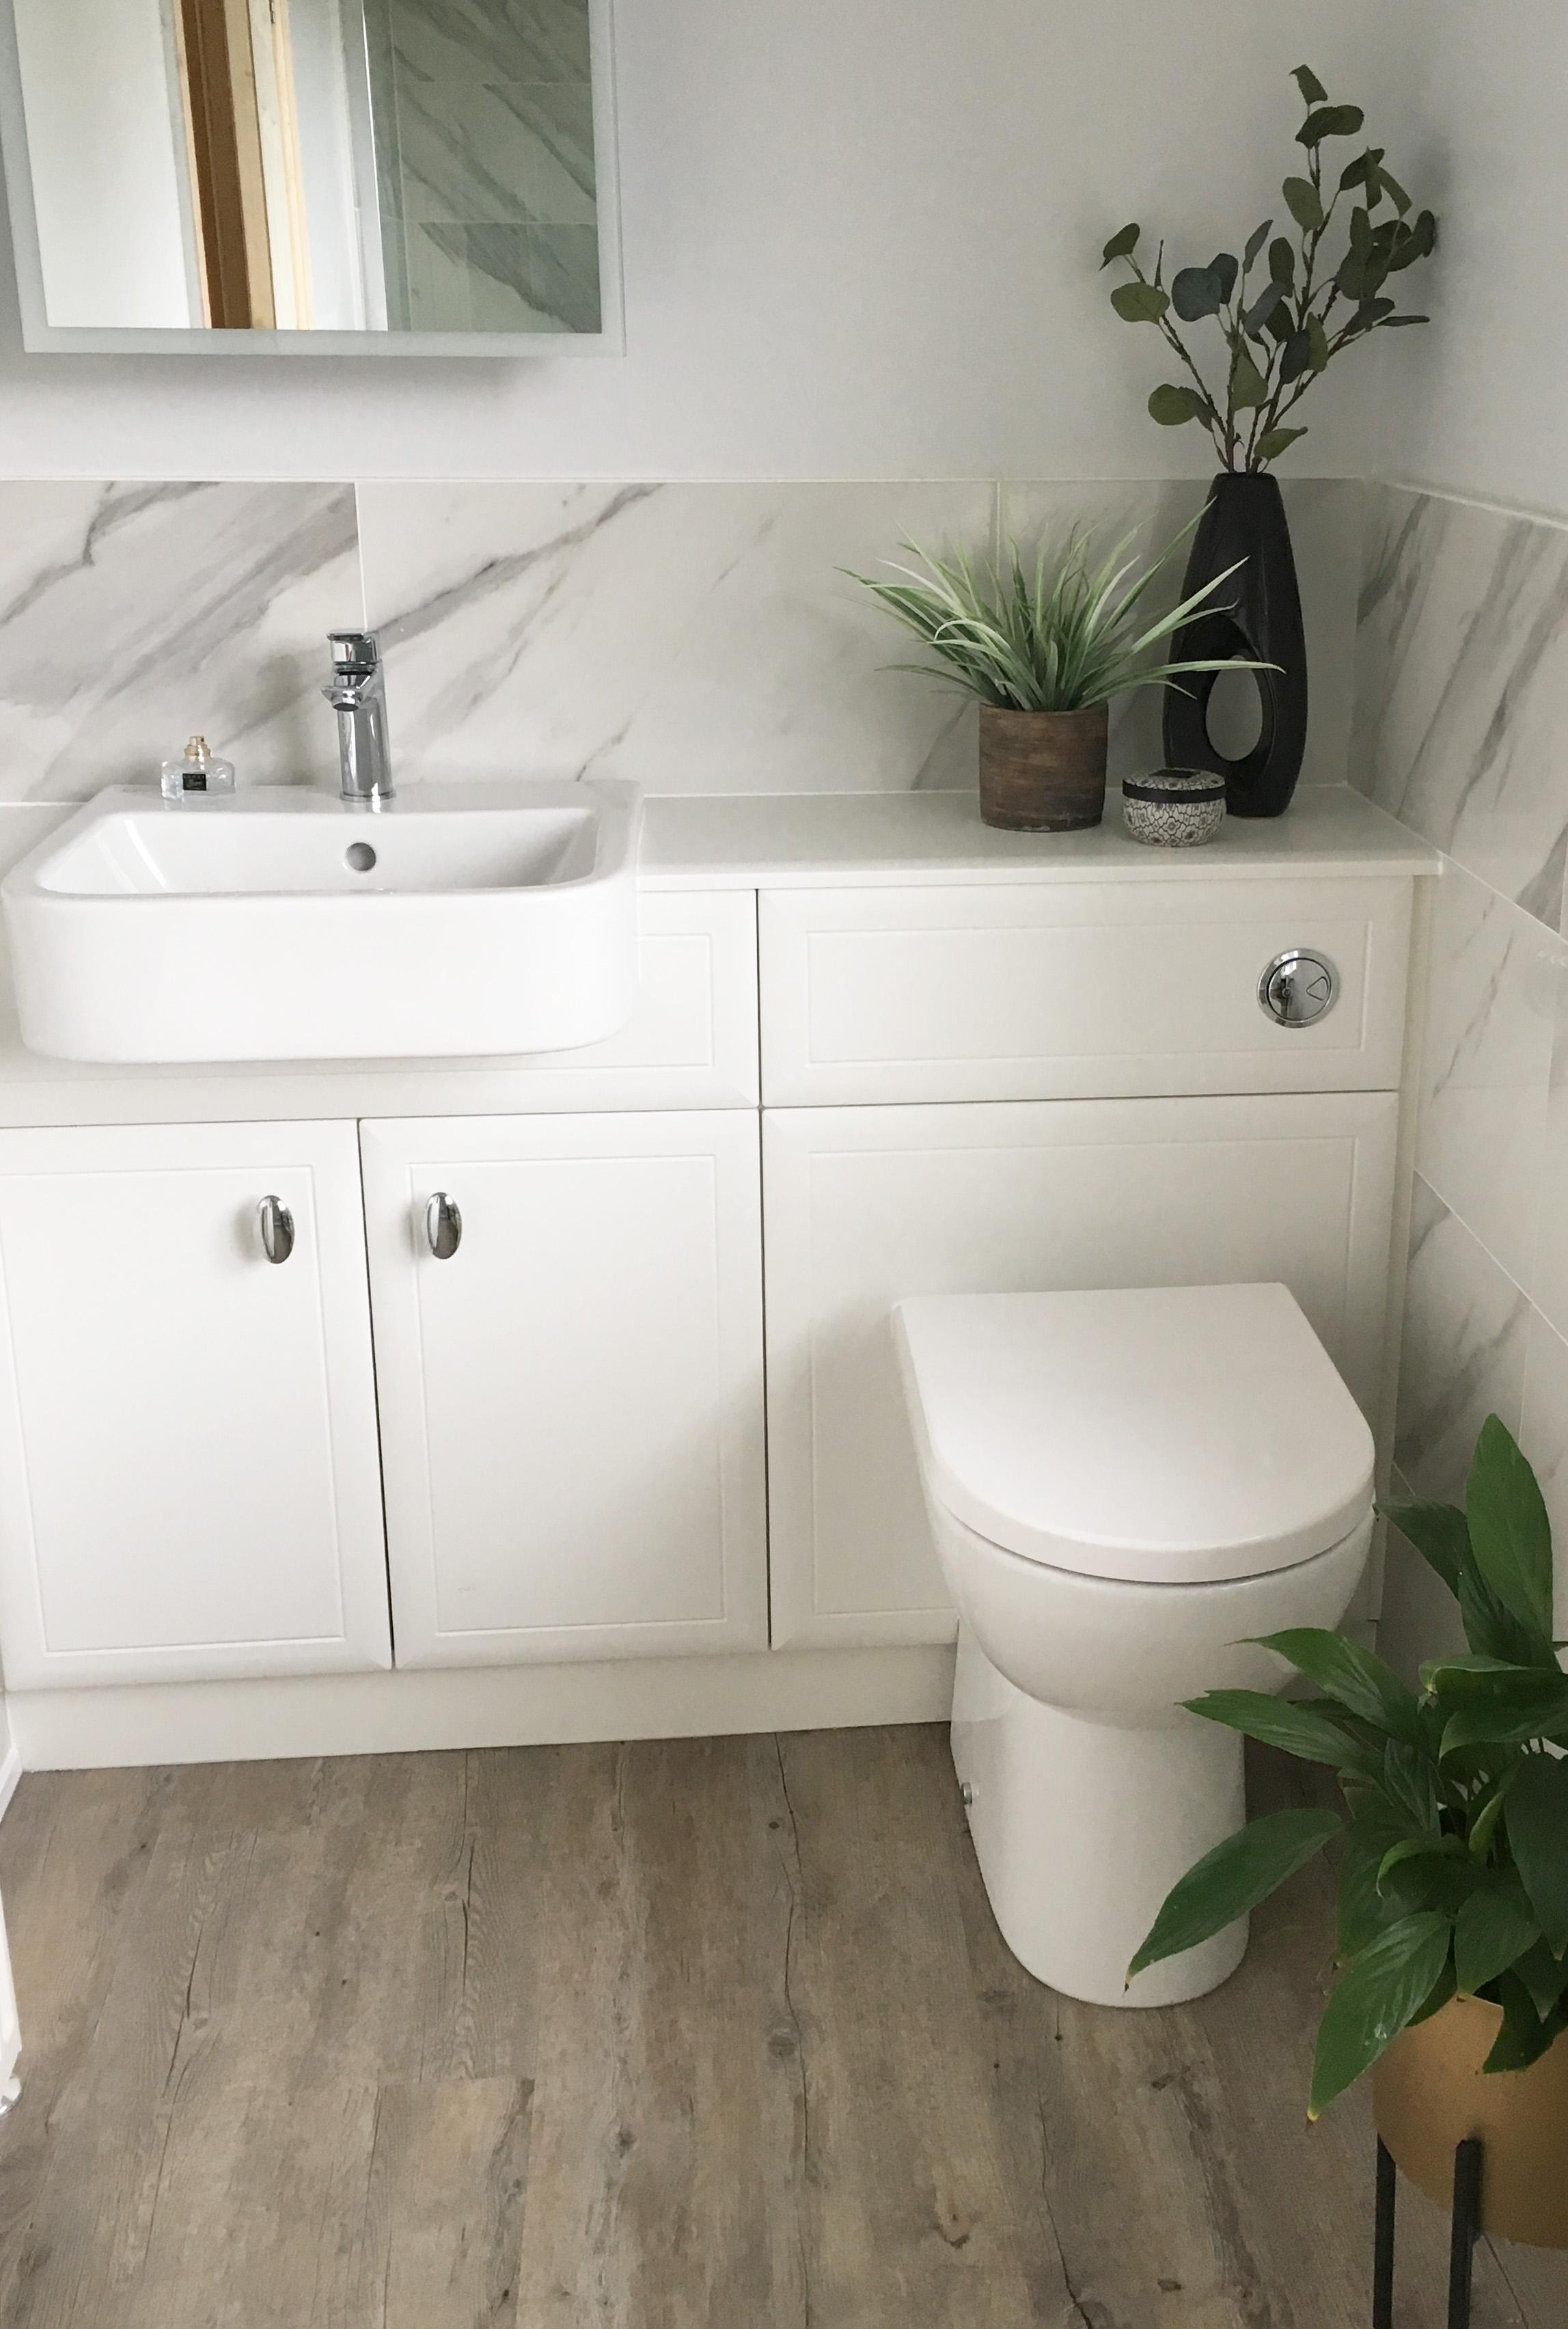 hallworth bathroom built ins.jpg